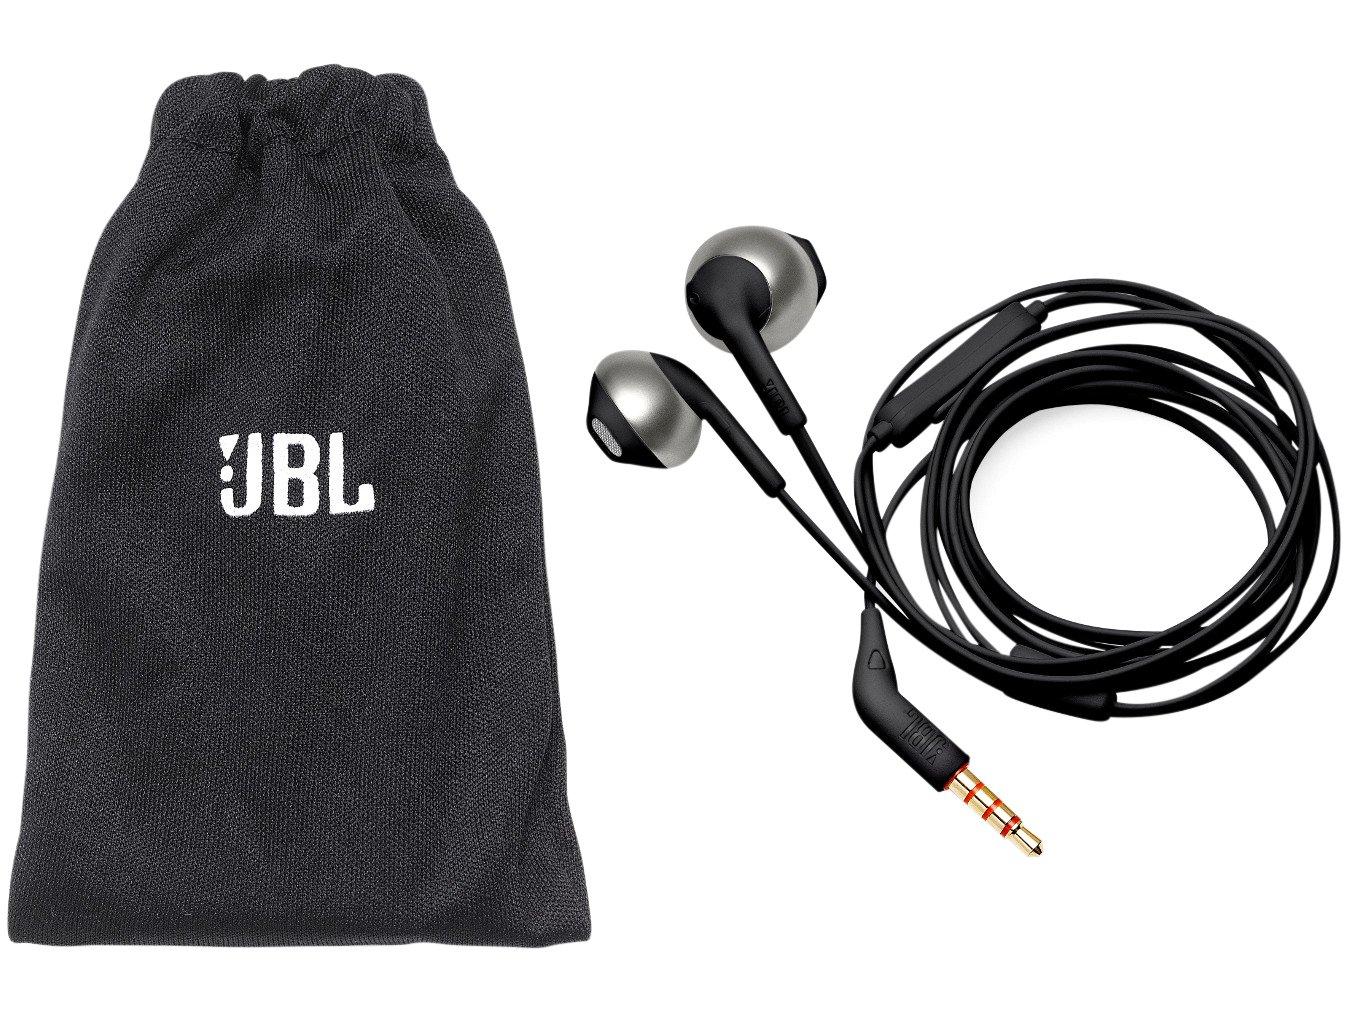 Fone de Ouvido Intra Auricular JBL com Microfone - Cabo P2 T205 - 1